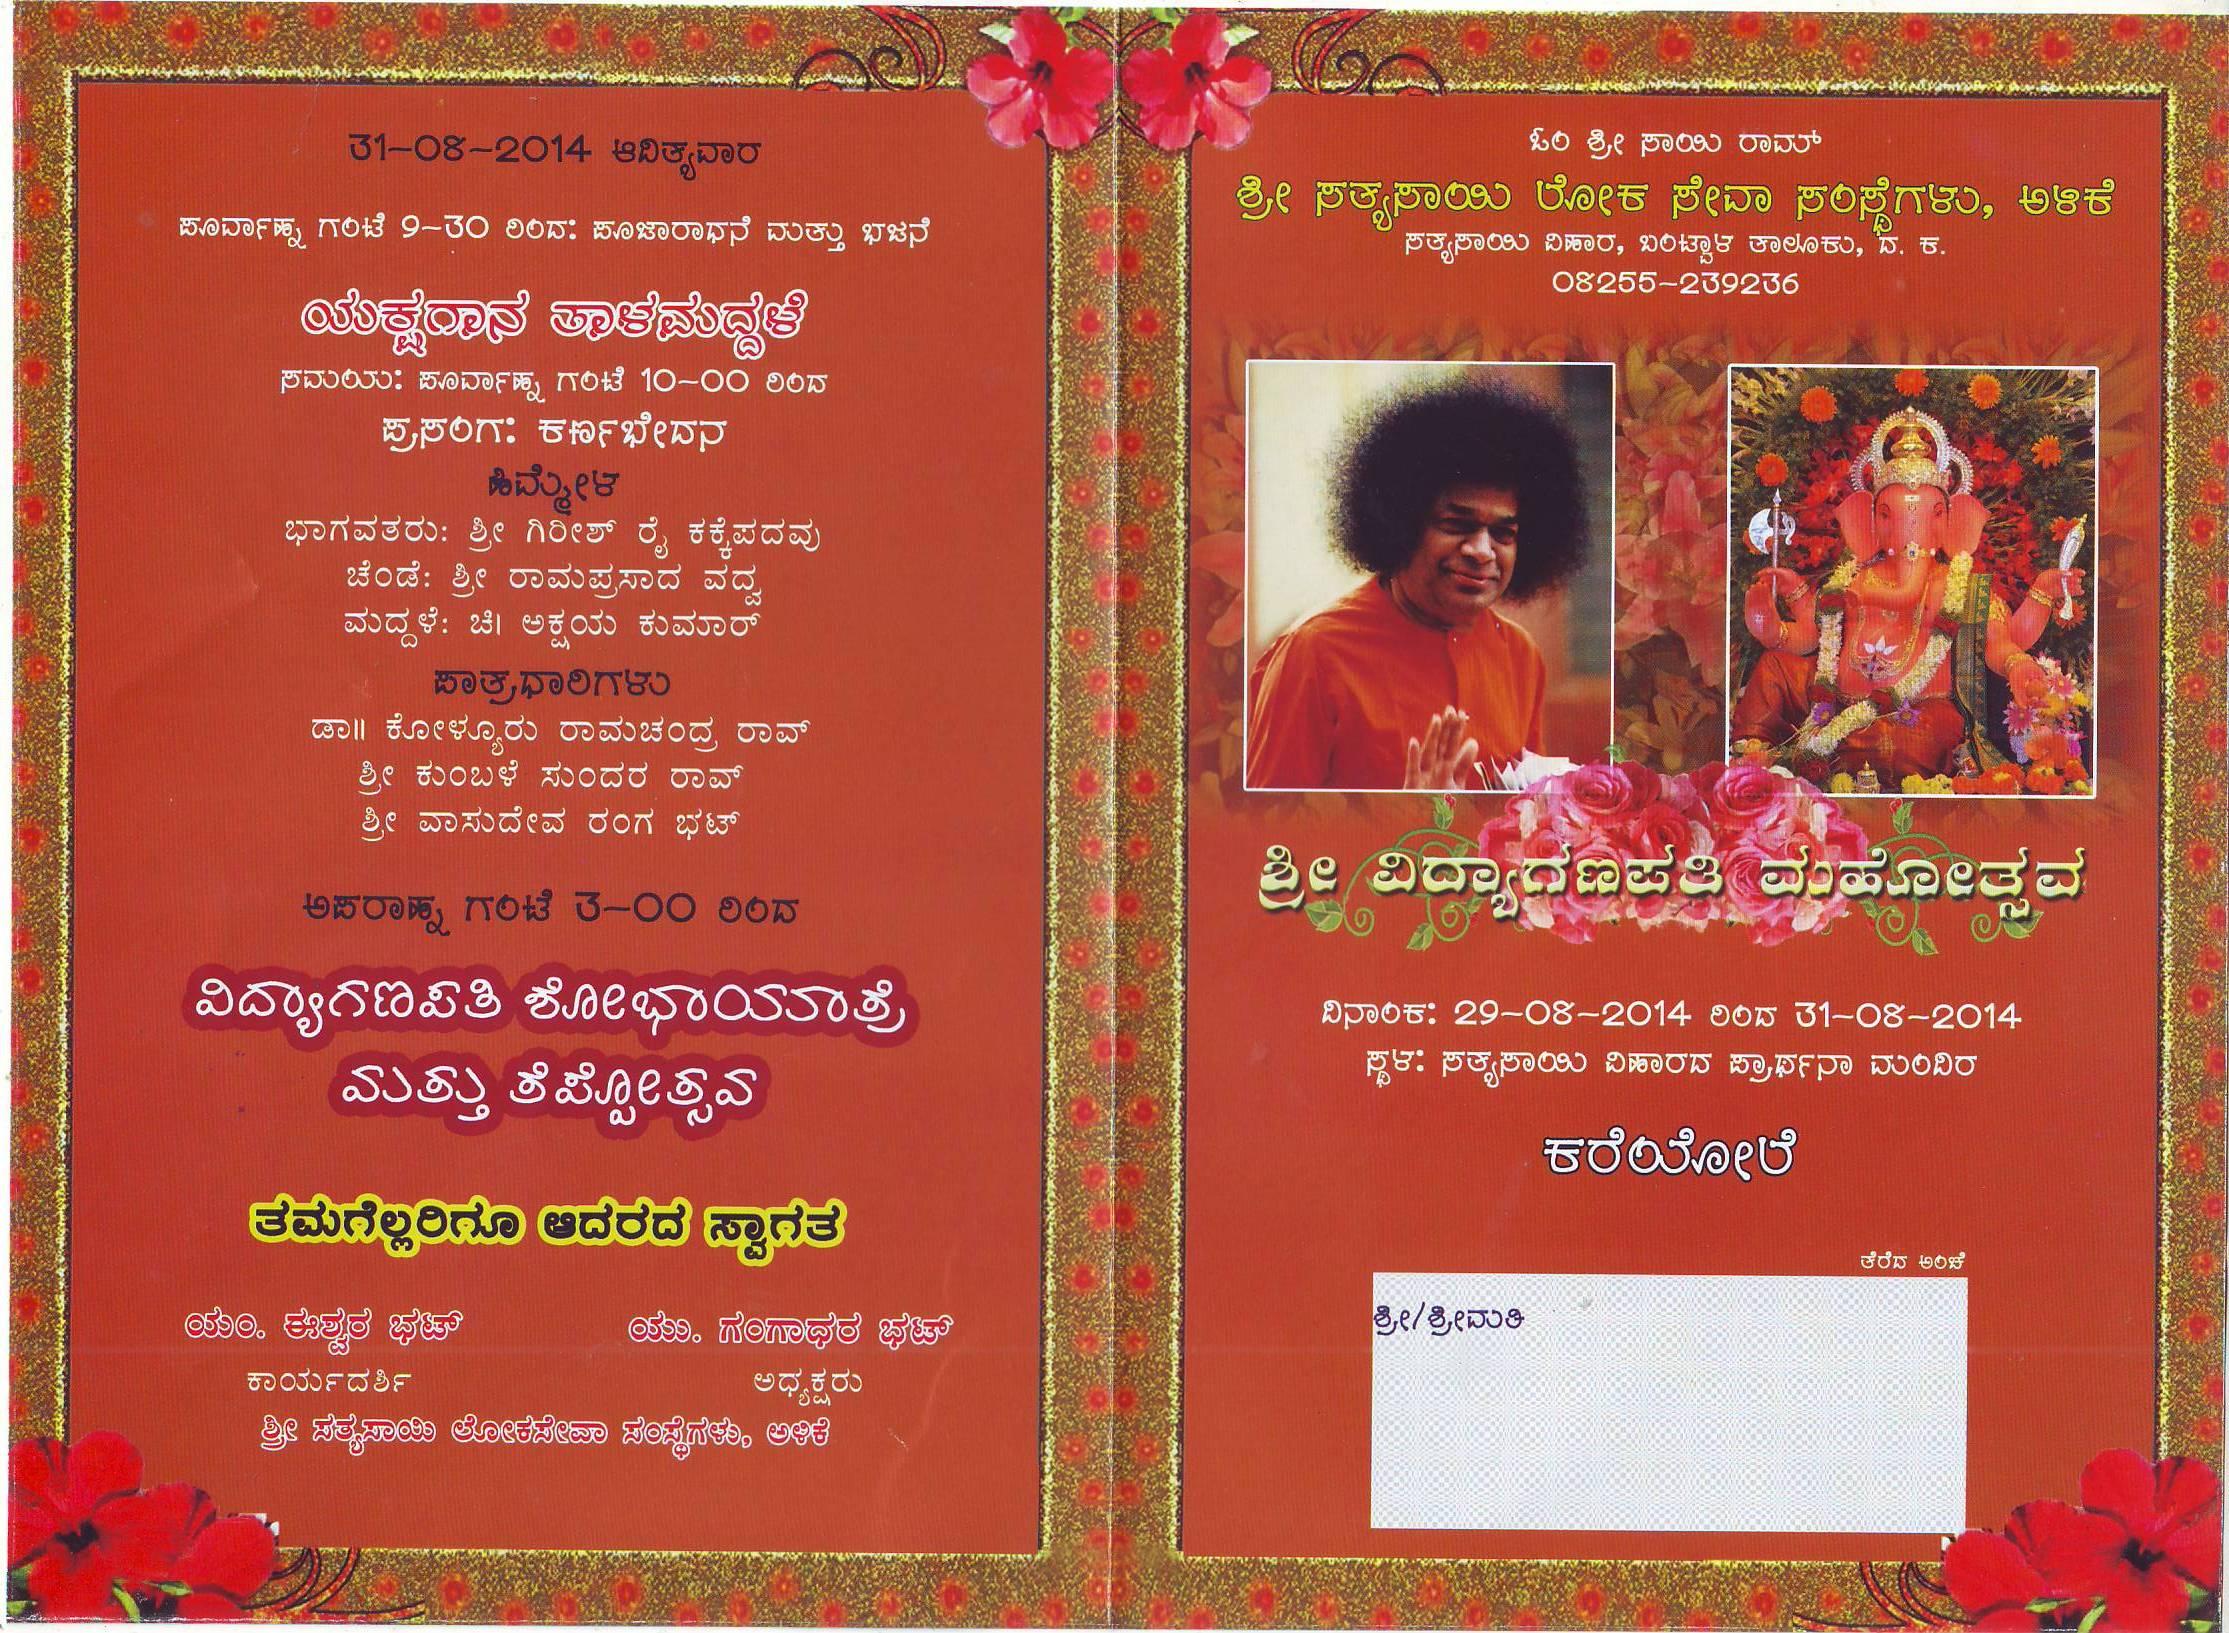 Invitation Page-1